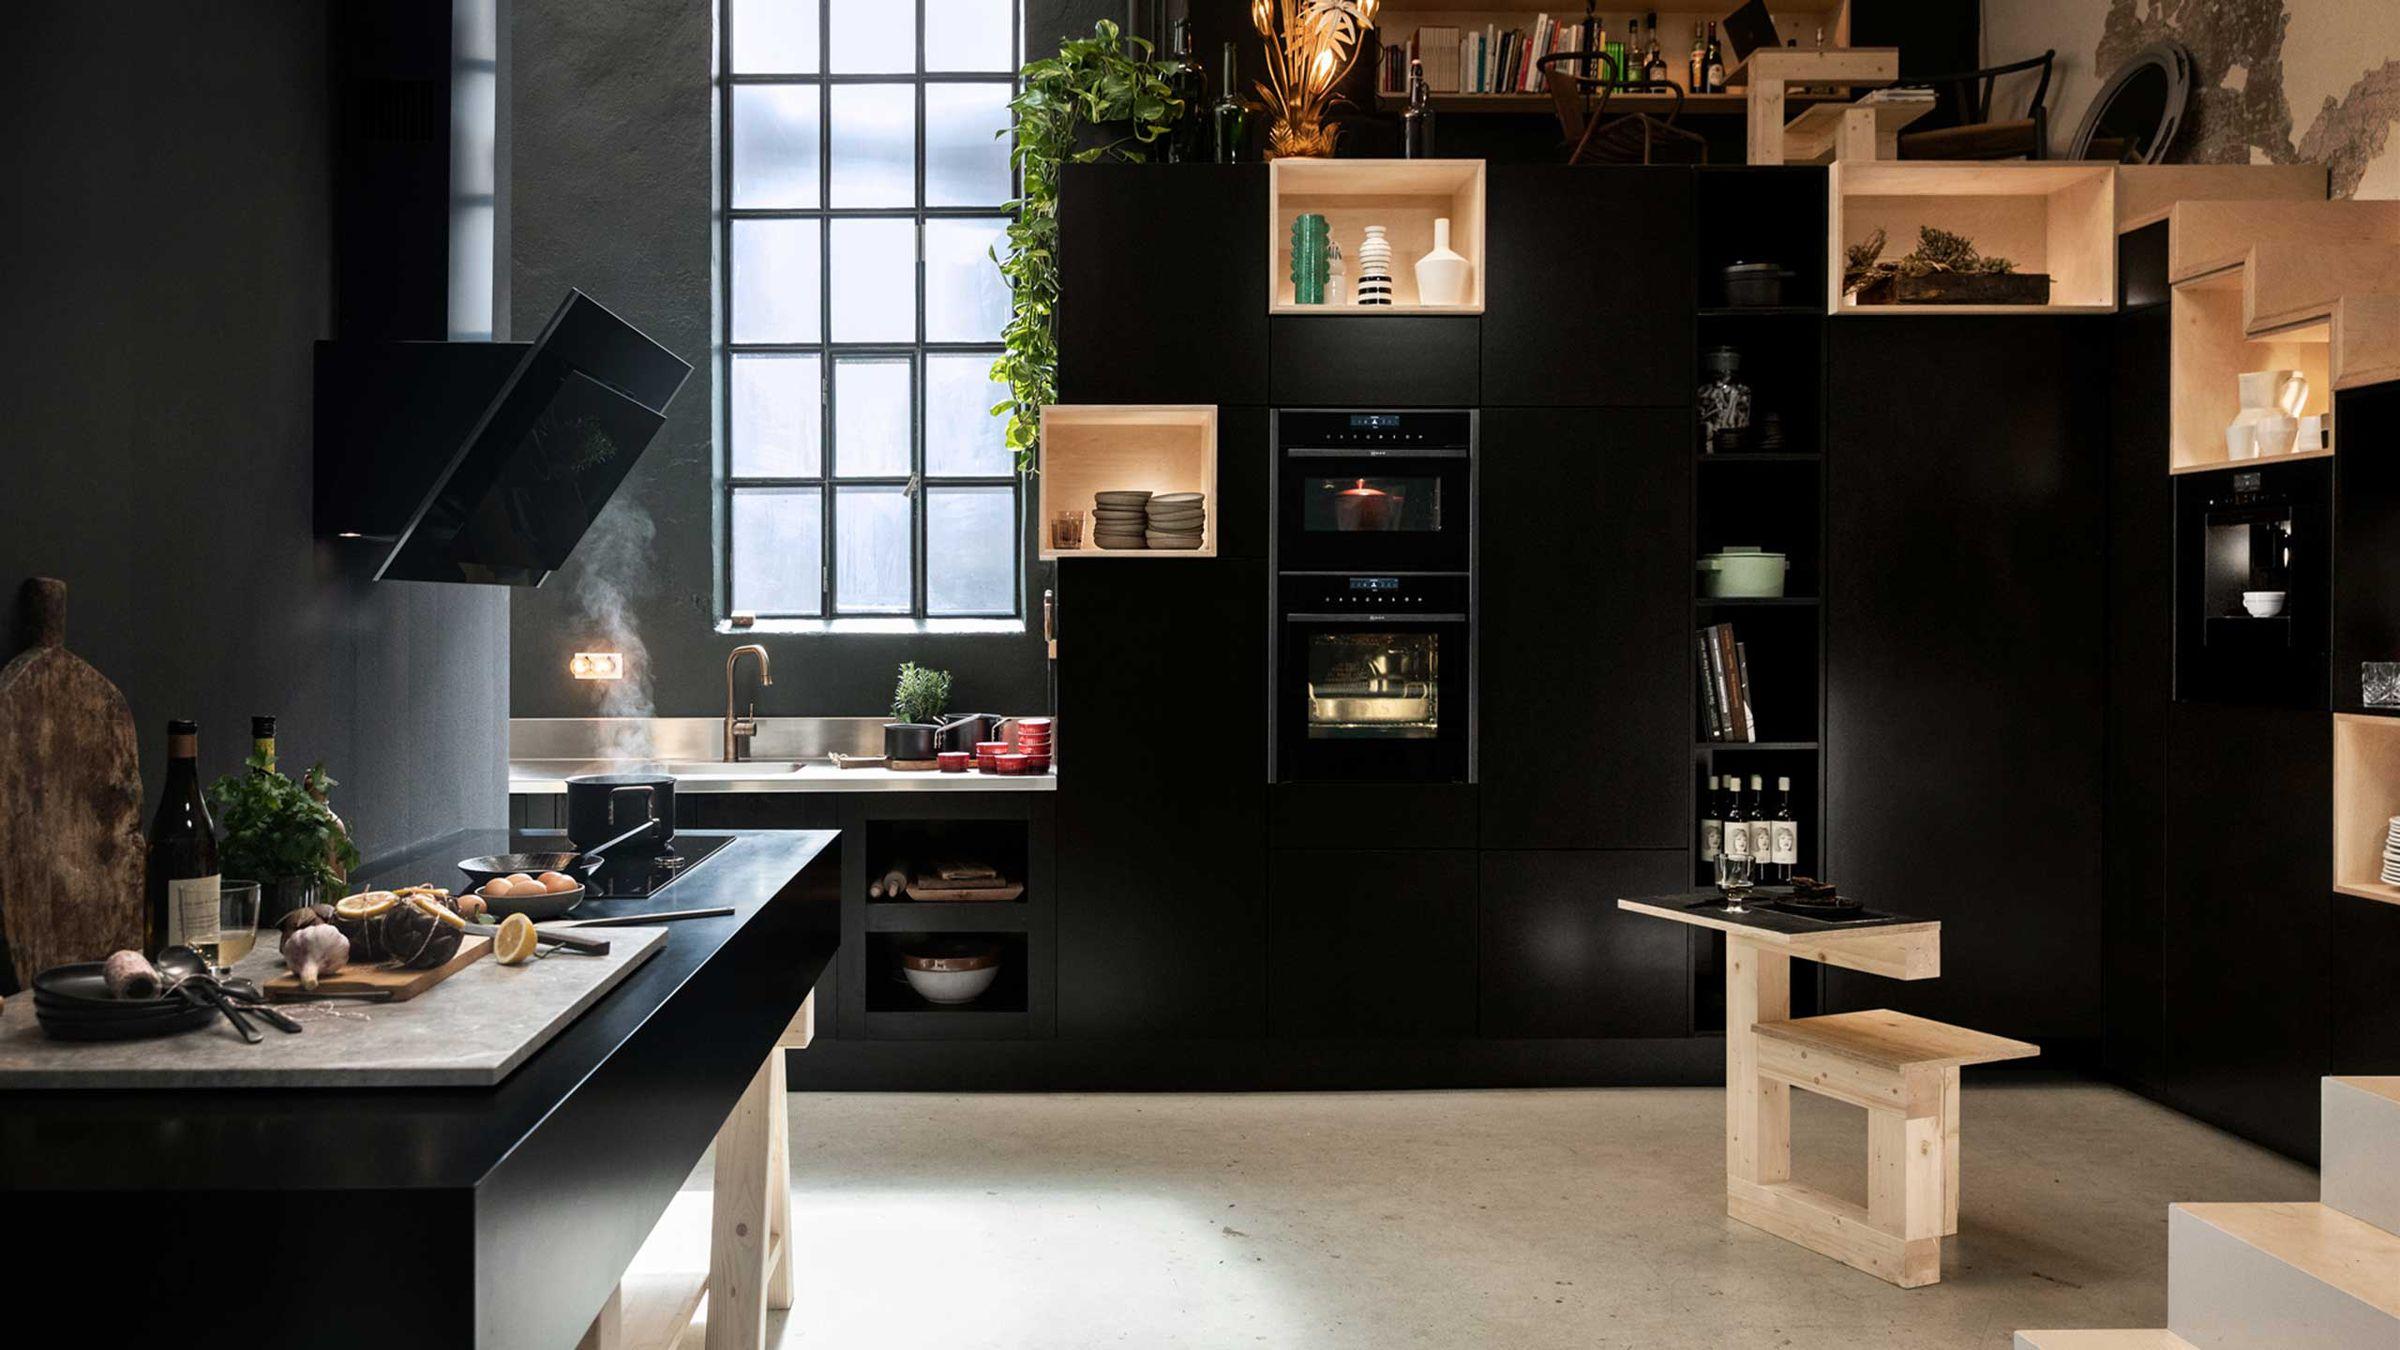 Neff Graphite Grey keukenapparaten #keuken #keukenapparaten #neff #graphitegrey #ovens #koffievolautomaat #afzuigkap #kookplaat